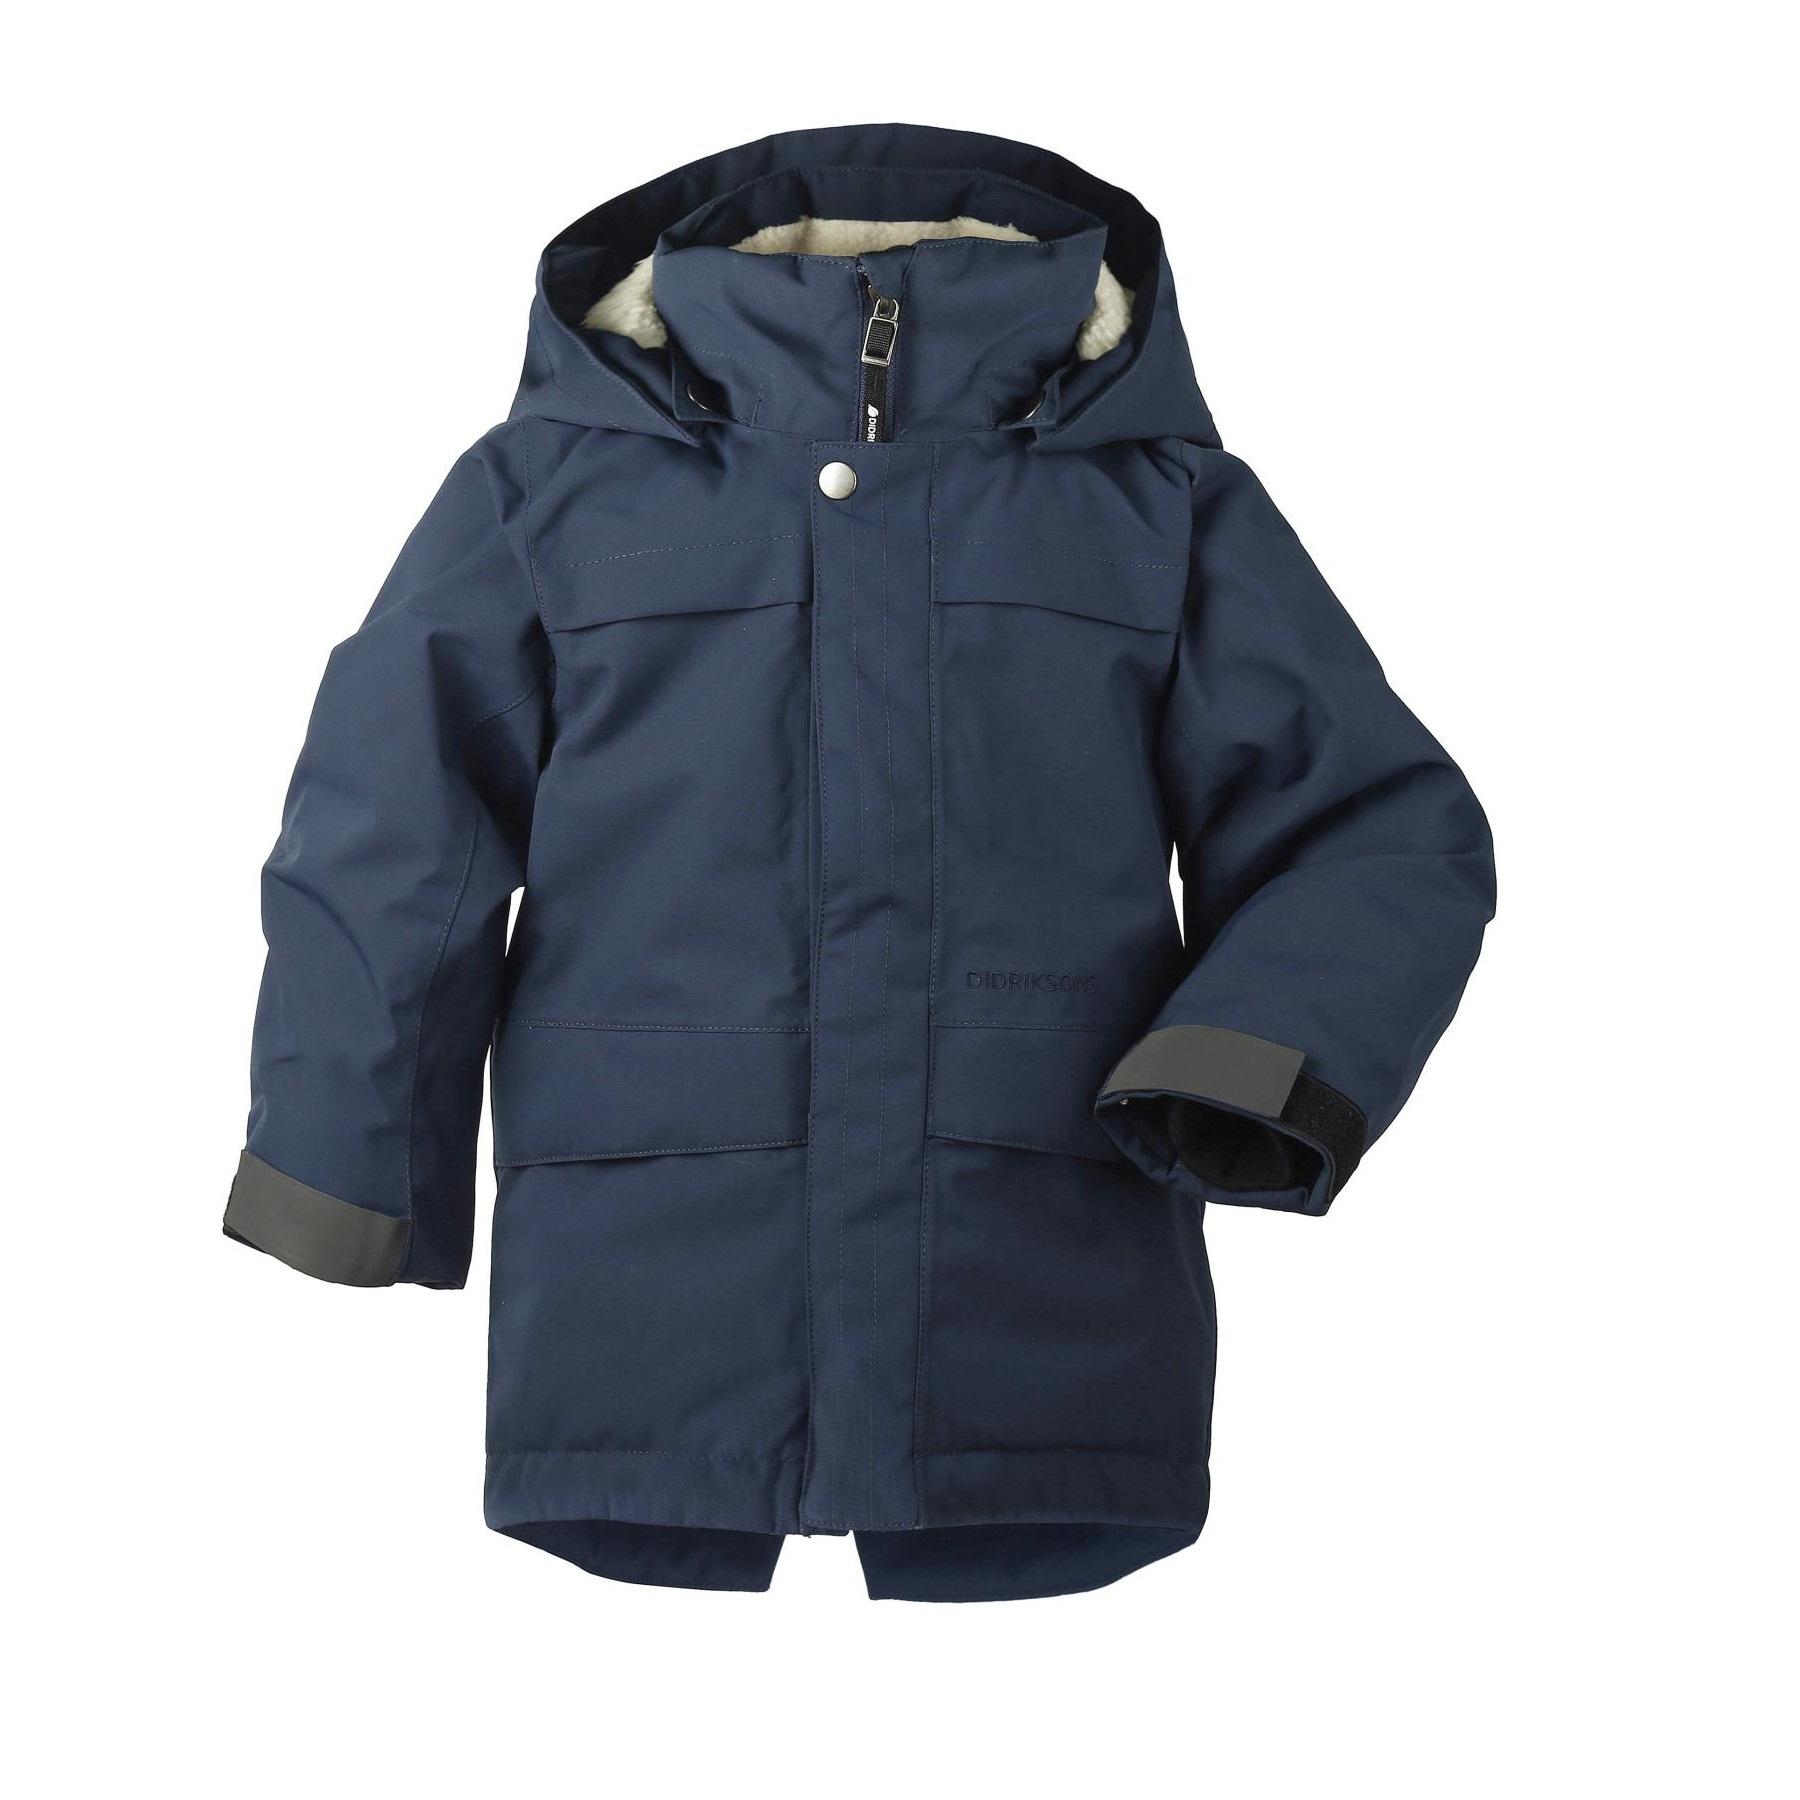 куртка Didriksons Bjorling Navy (морской бриз)